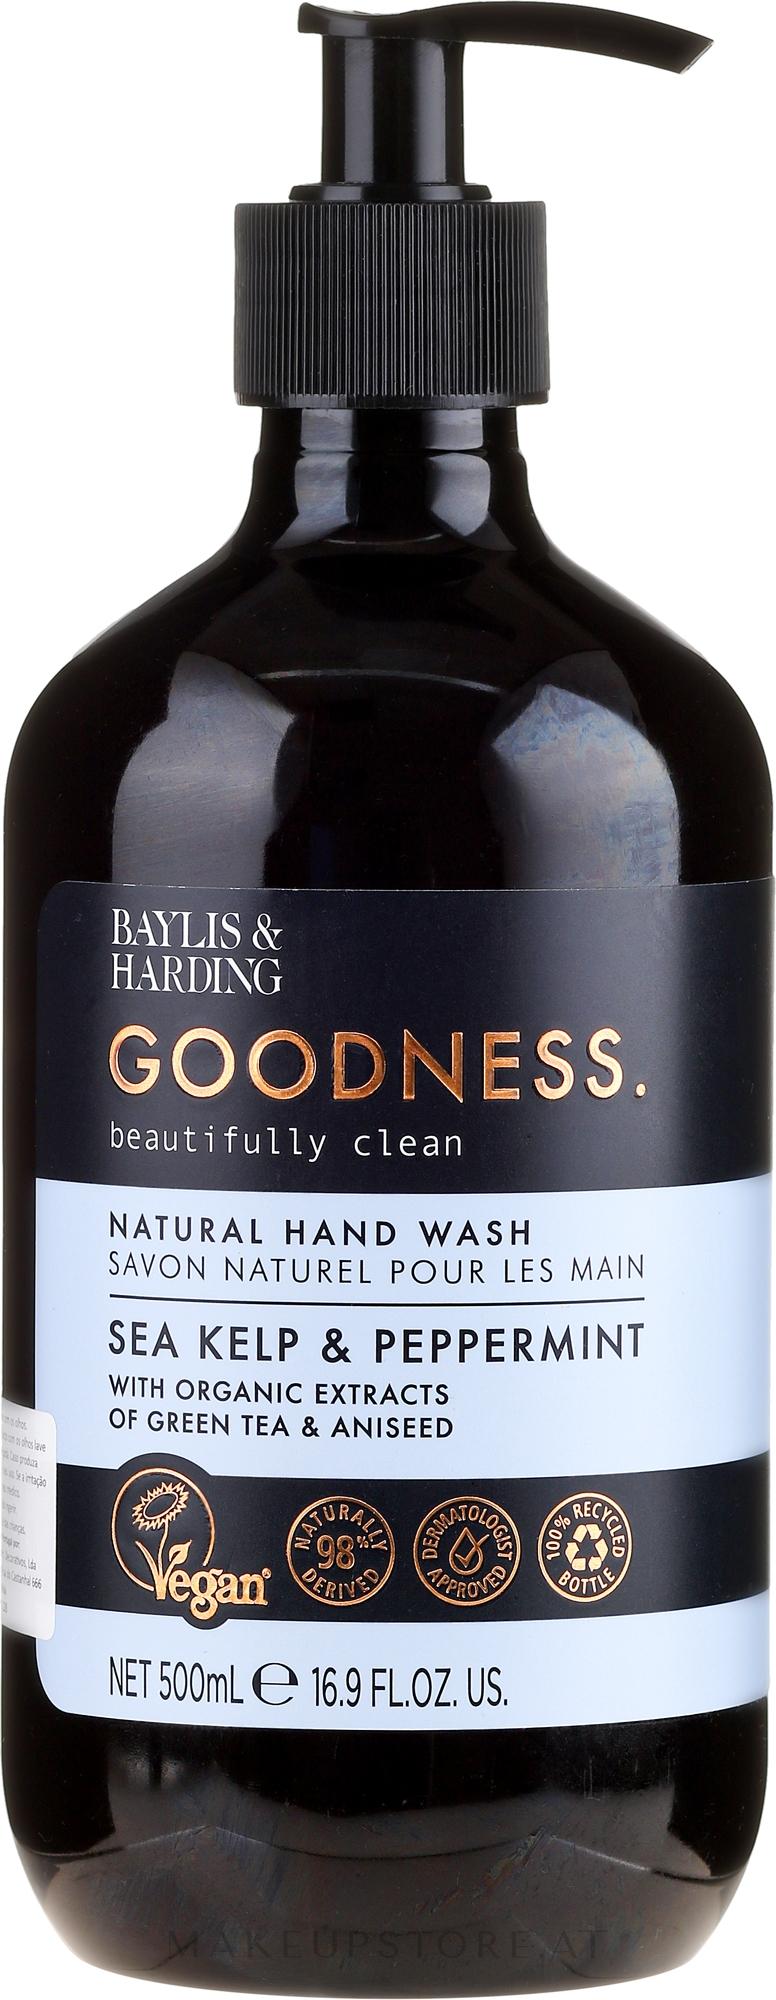 Natürliche Handseife Sea Kelp & Peppermint - Baylis & Harding Goodness Sea Kelp & Peppermint Natutal Hand Wash — Bild 500 ml